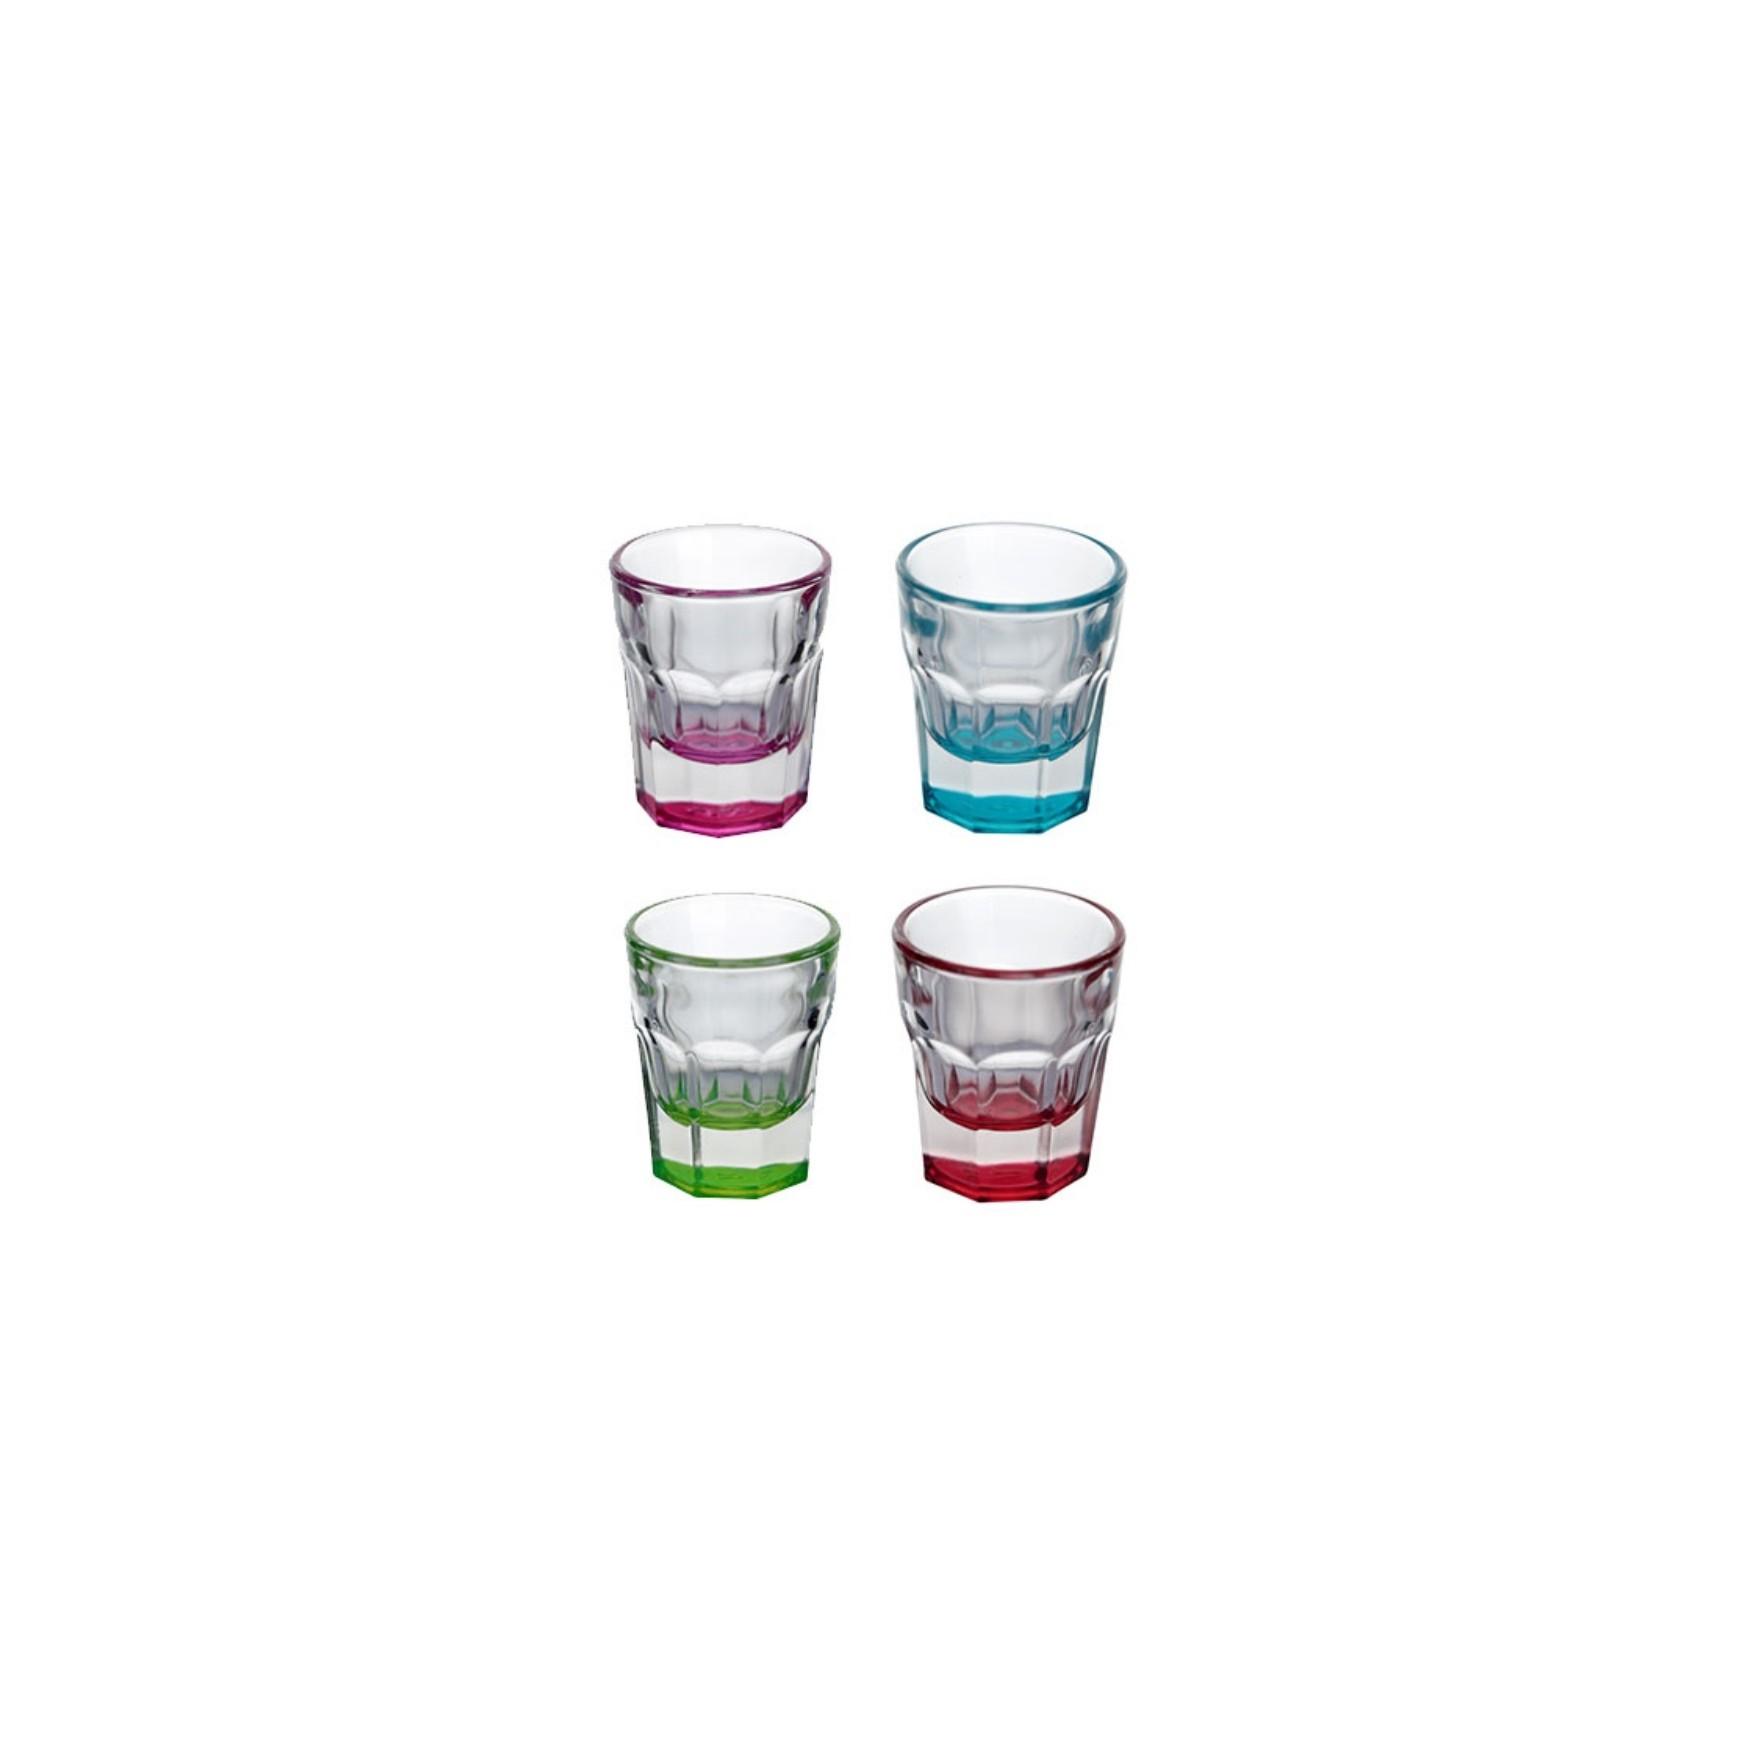 Jogo de Copos de Vidro para Dose 4 Pecas 36ml - Full Fit Industria